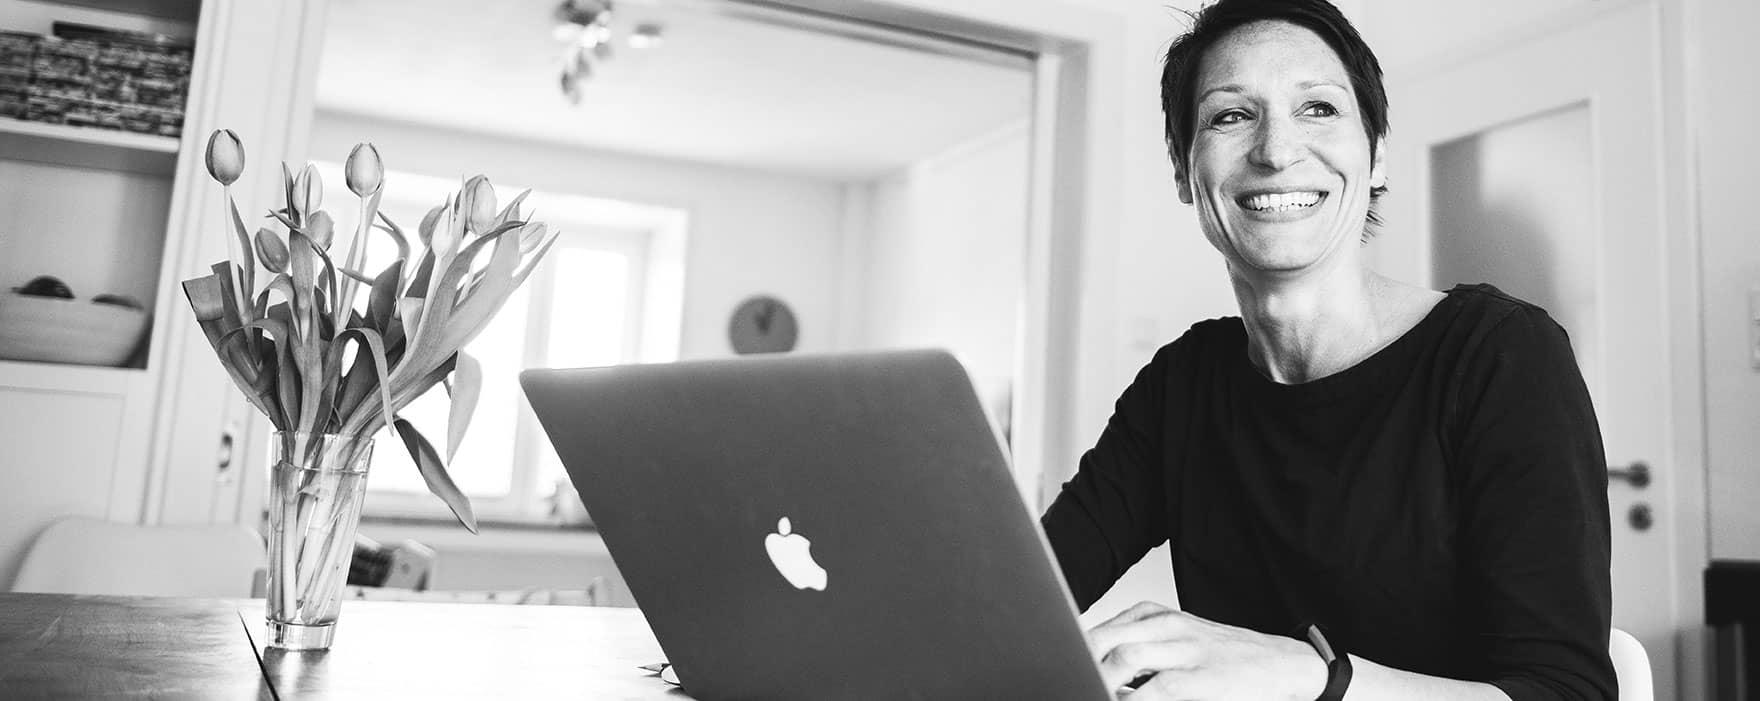 SEO Texter Inga Symann erstellt Texte für Websites